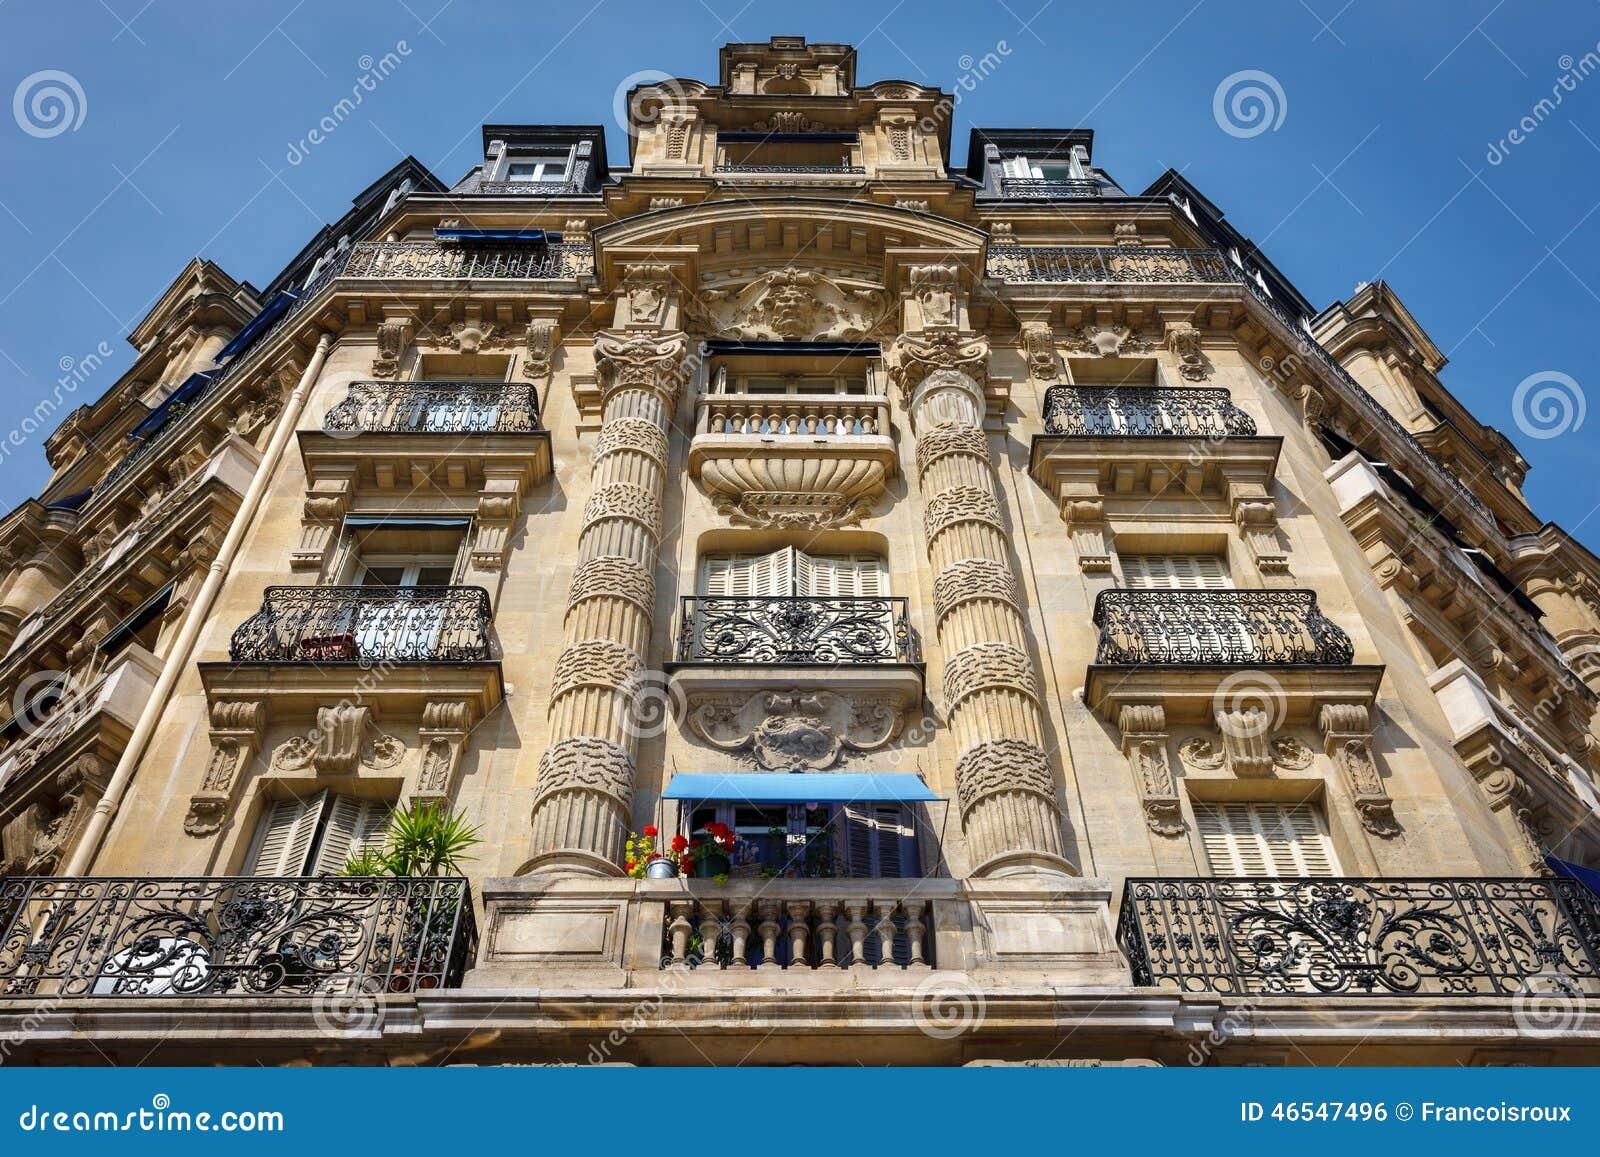 Paris Architecture Haussmannian Facade And Ornaments